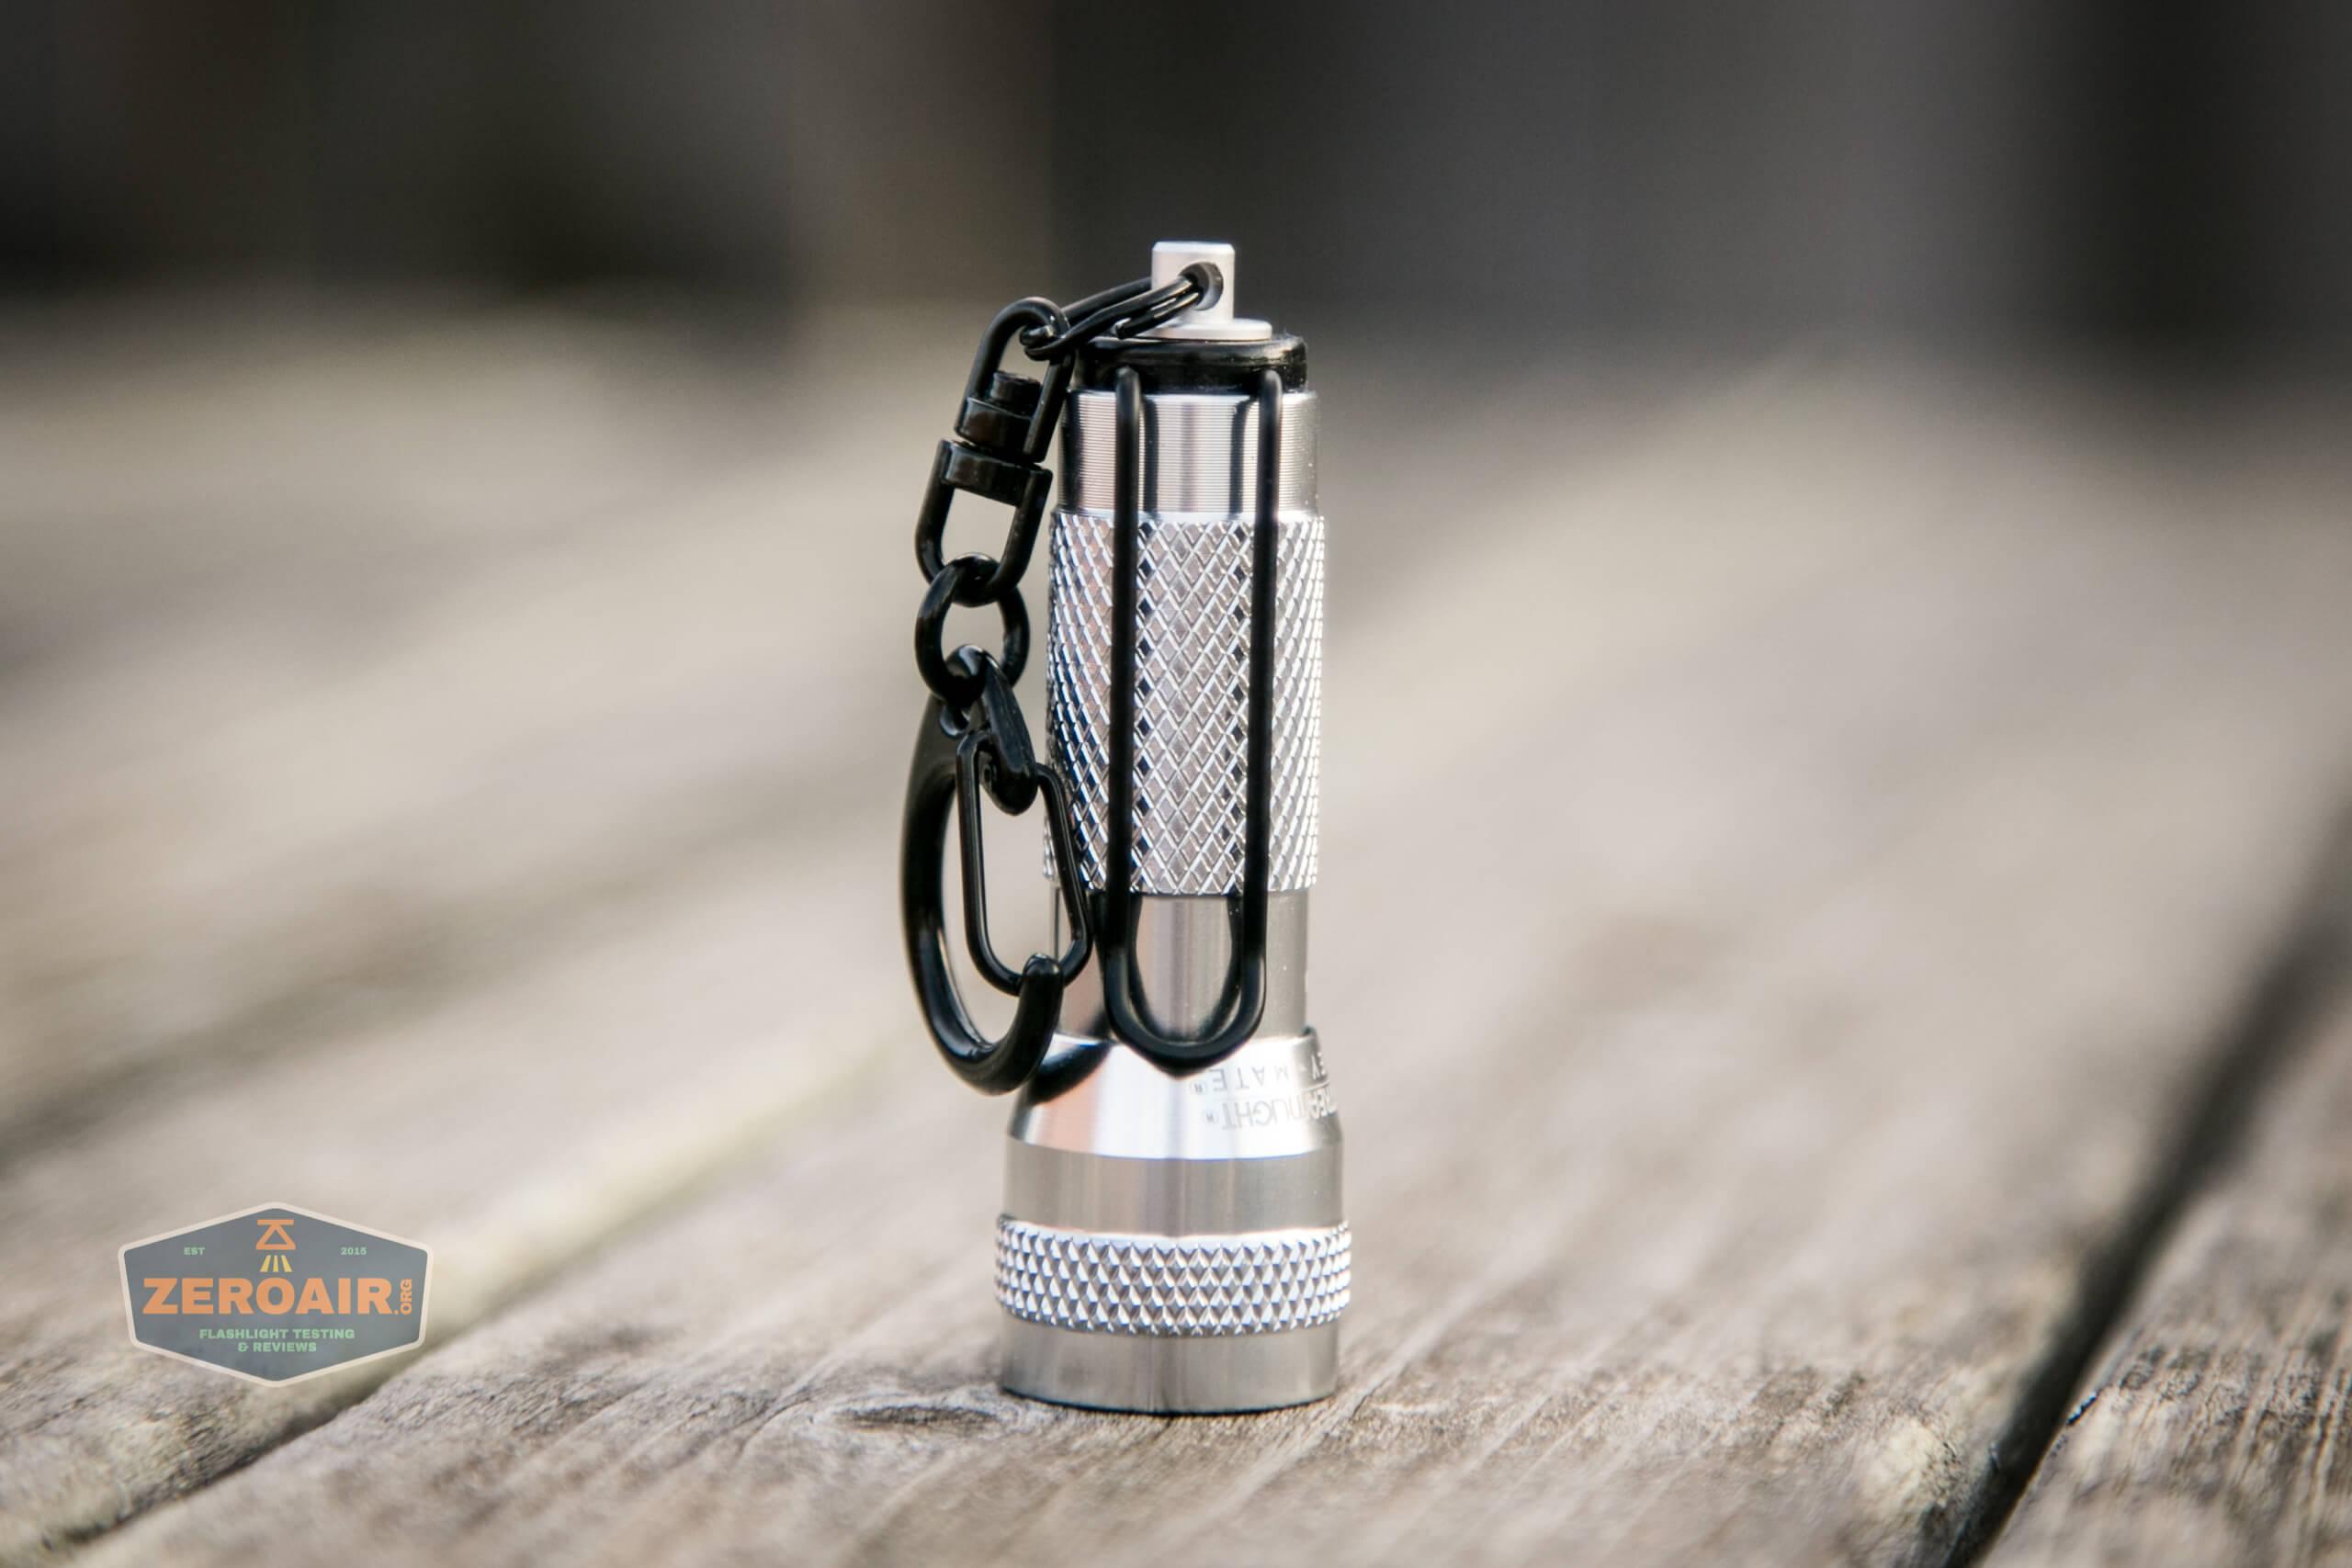 streamlight key-mate 72101 keychain twisty flashlight headstanding